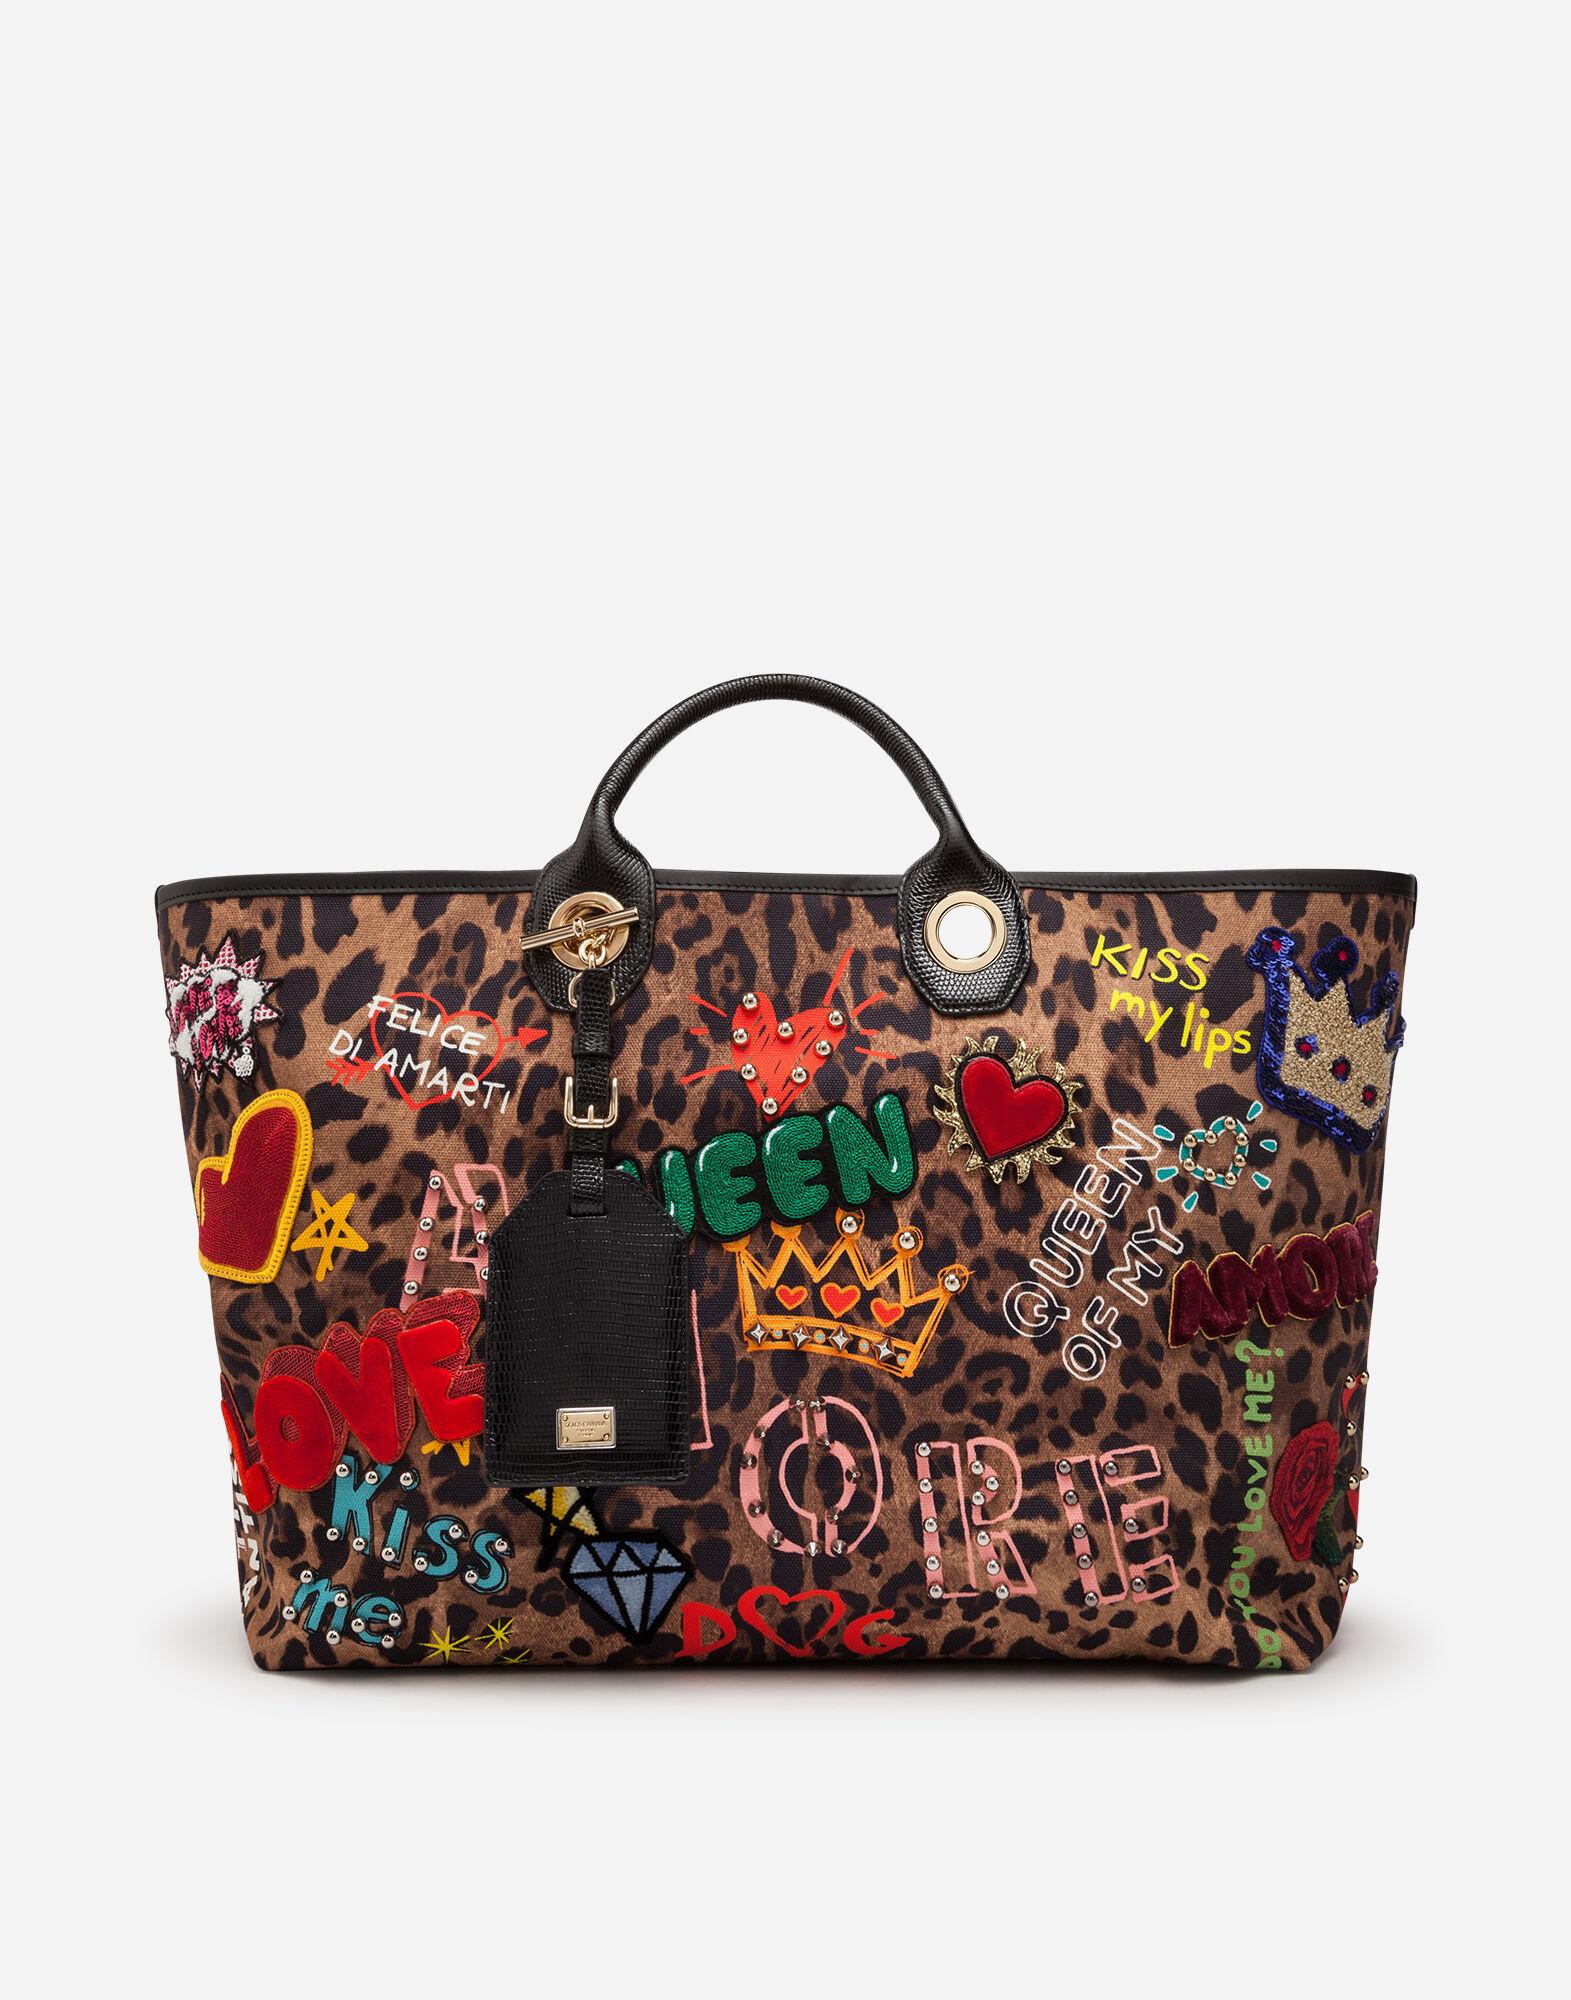 Capri Shopping Bag In Printed Fabric And Patch Applications And Iguana Print Calfskin Trim in Leopard Print